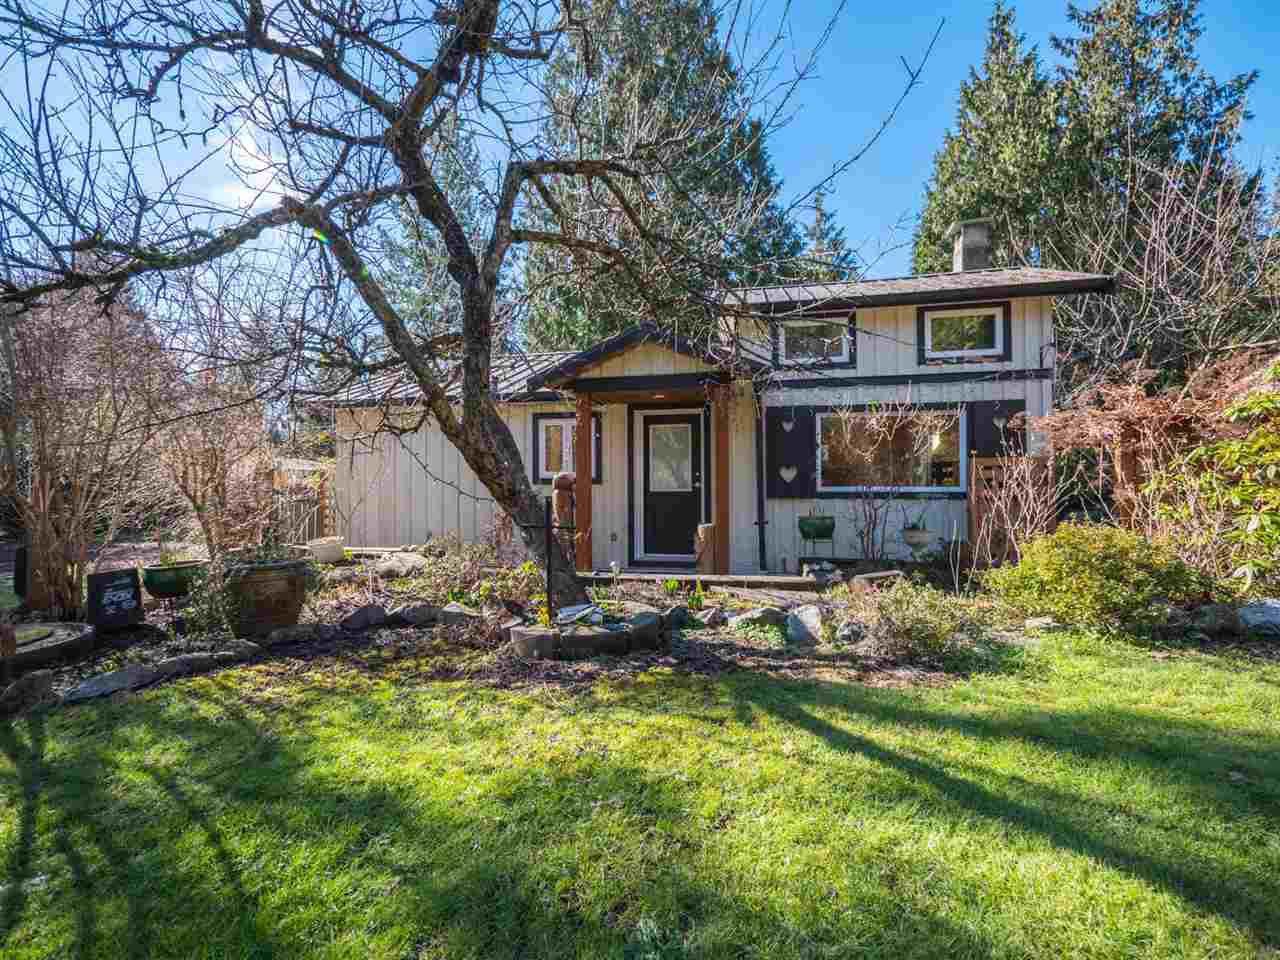 Photo 18: Photos: 3592 BEACH Avenue: Roberts Creek House for sale (Sunshine Coast)  : MLS®# R2244747